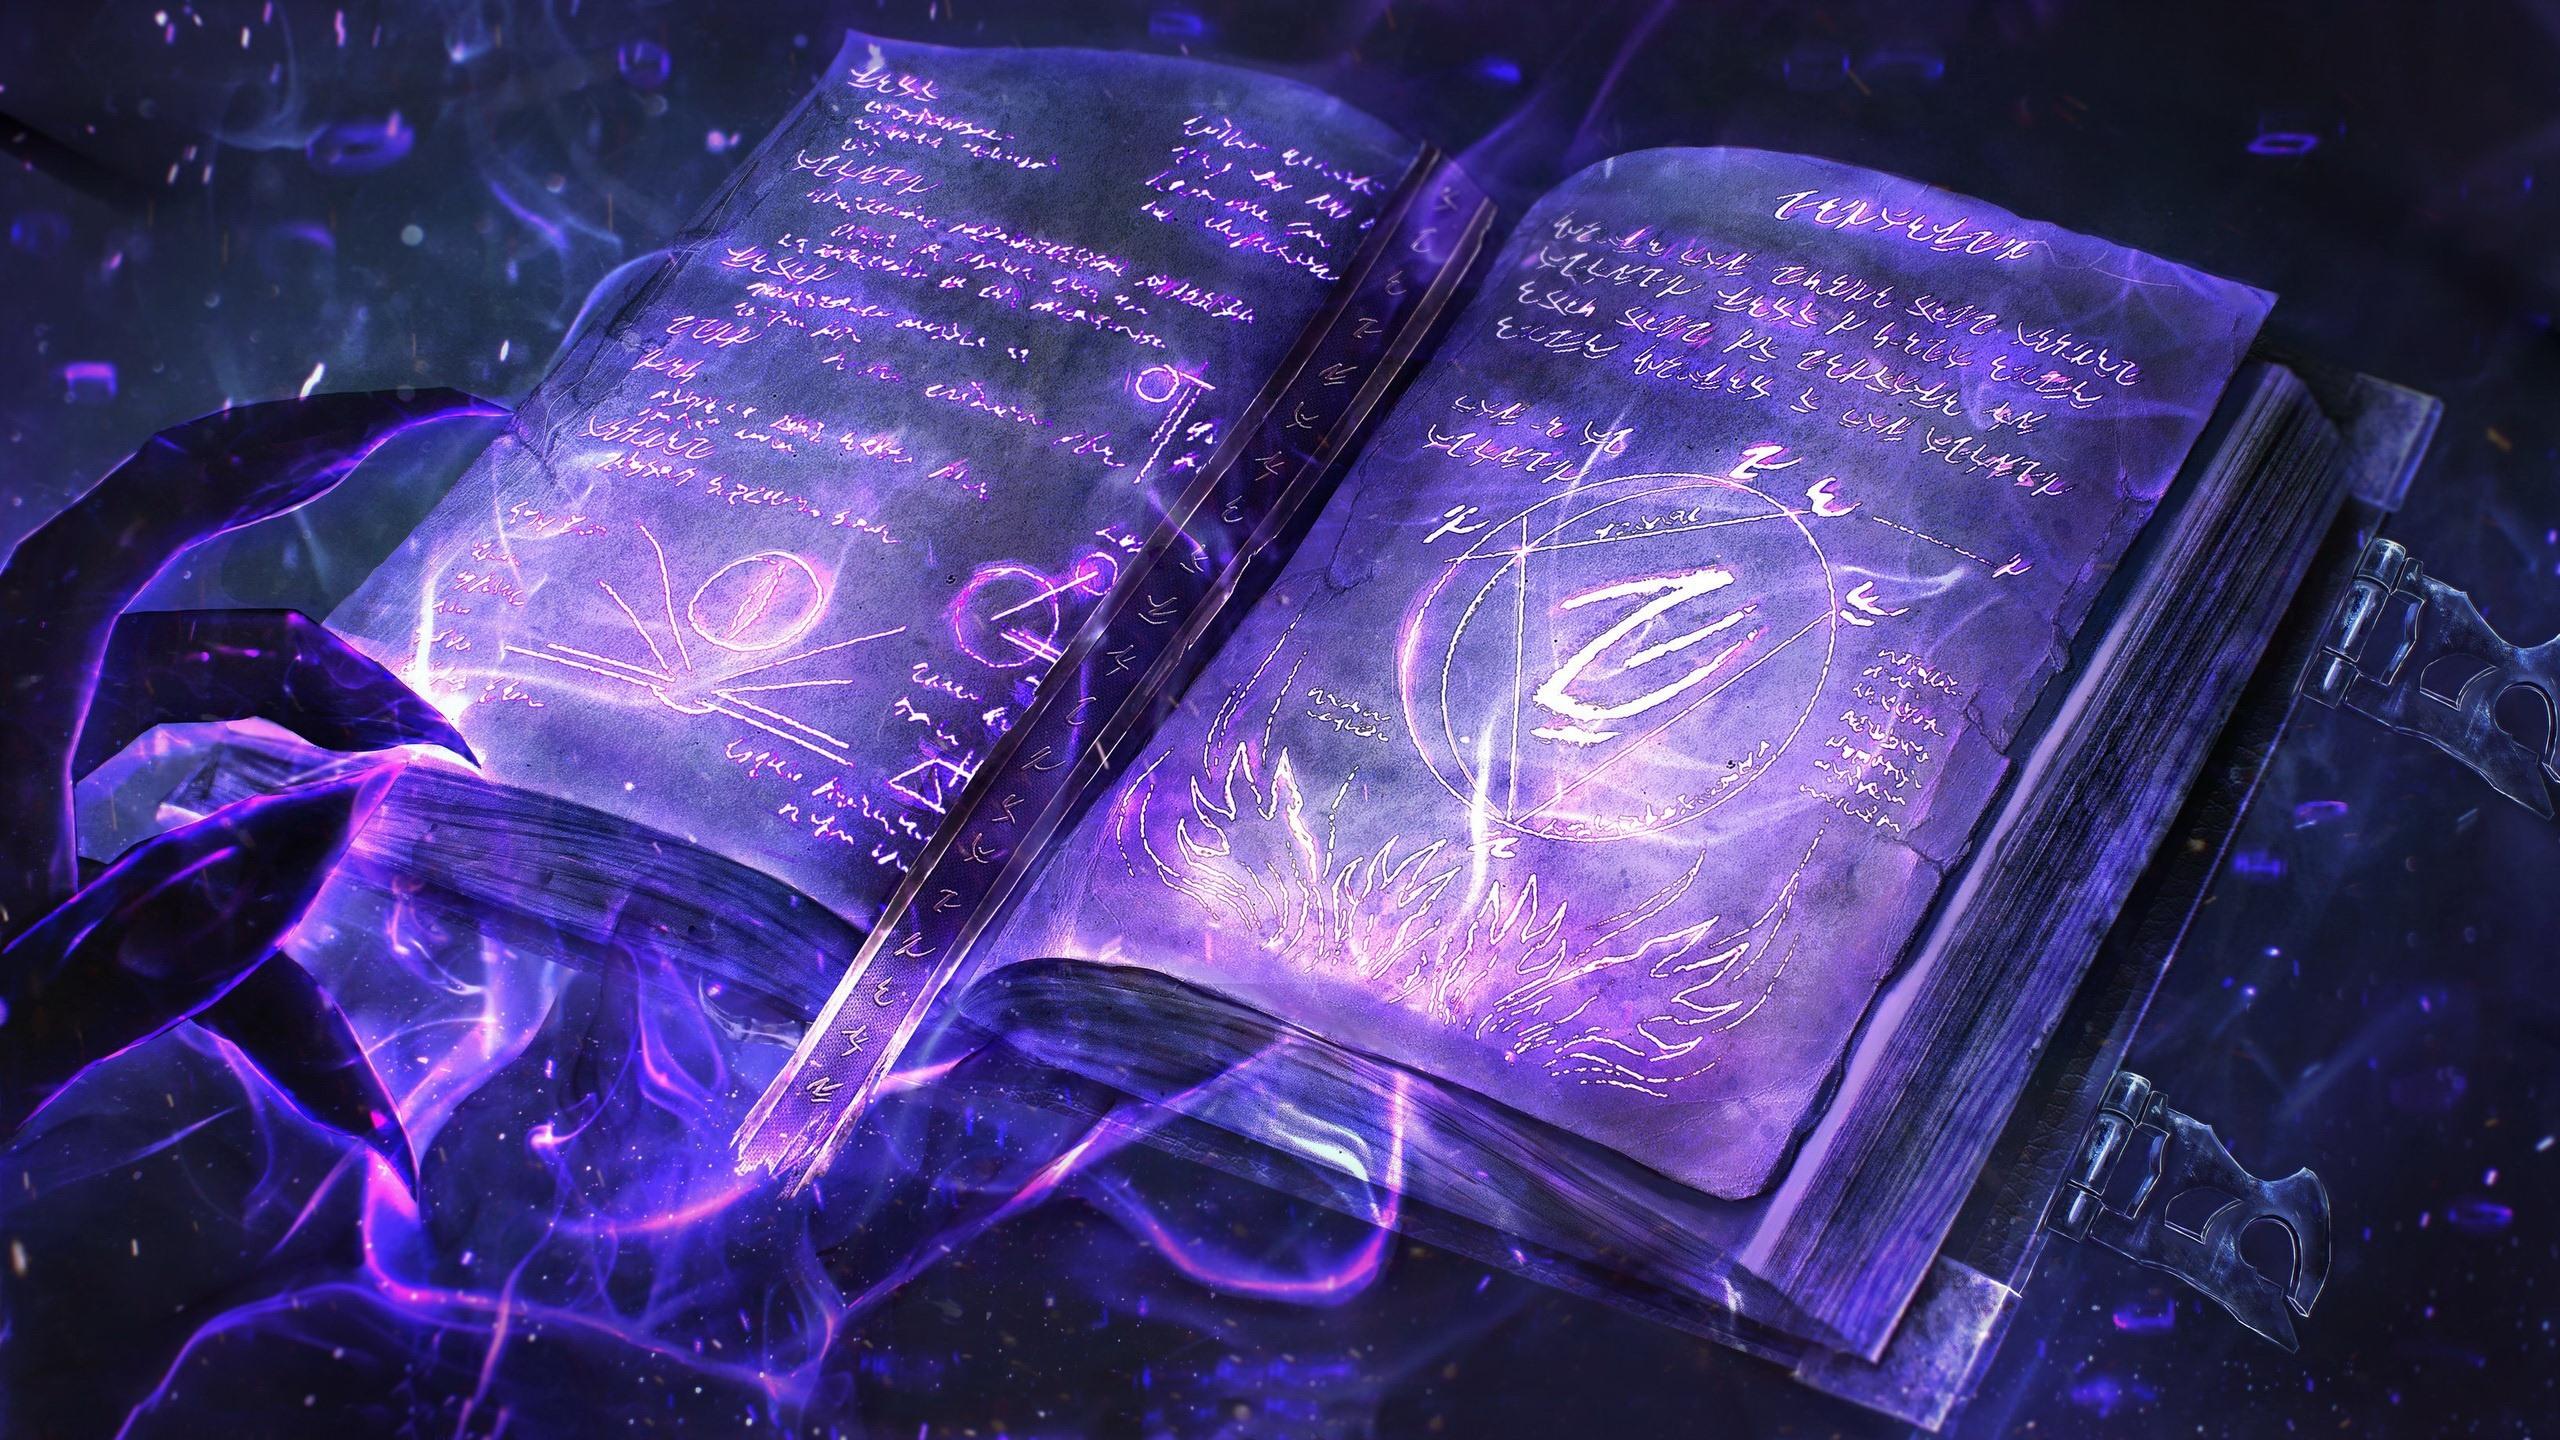 Wallpaper Magic Book Creative 2560x1440 Qhd Picture Image